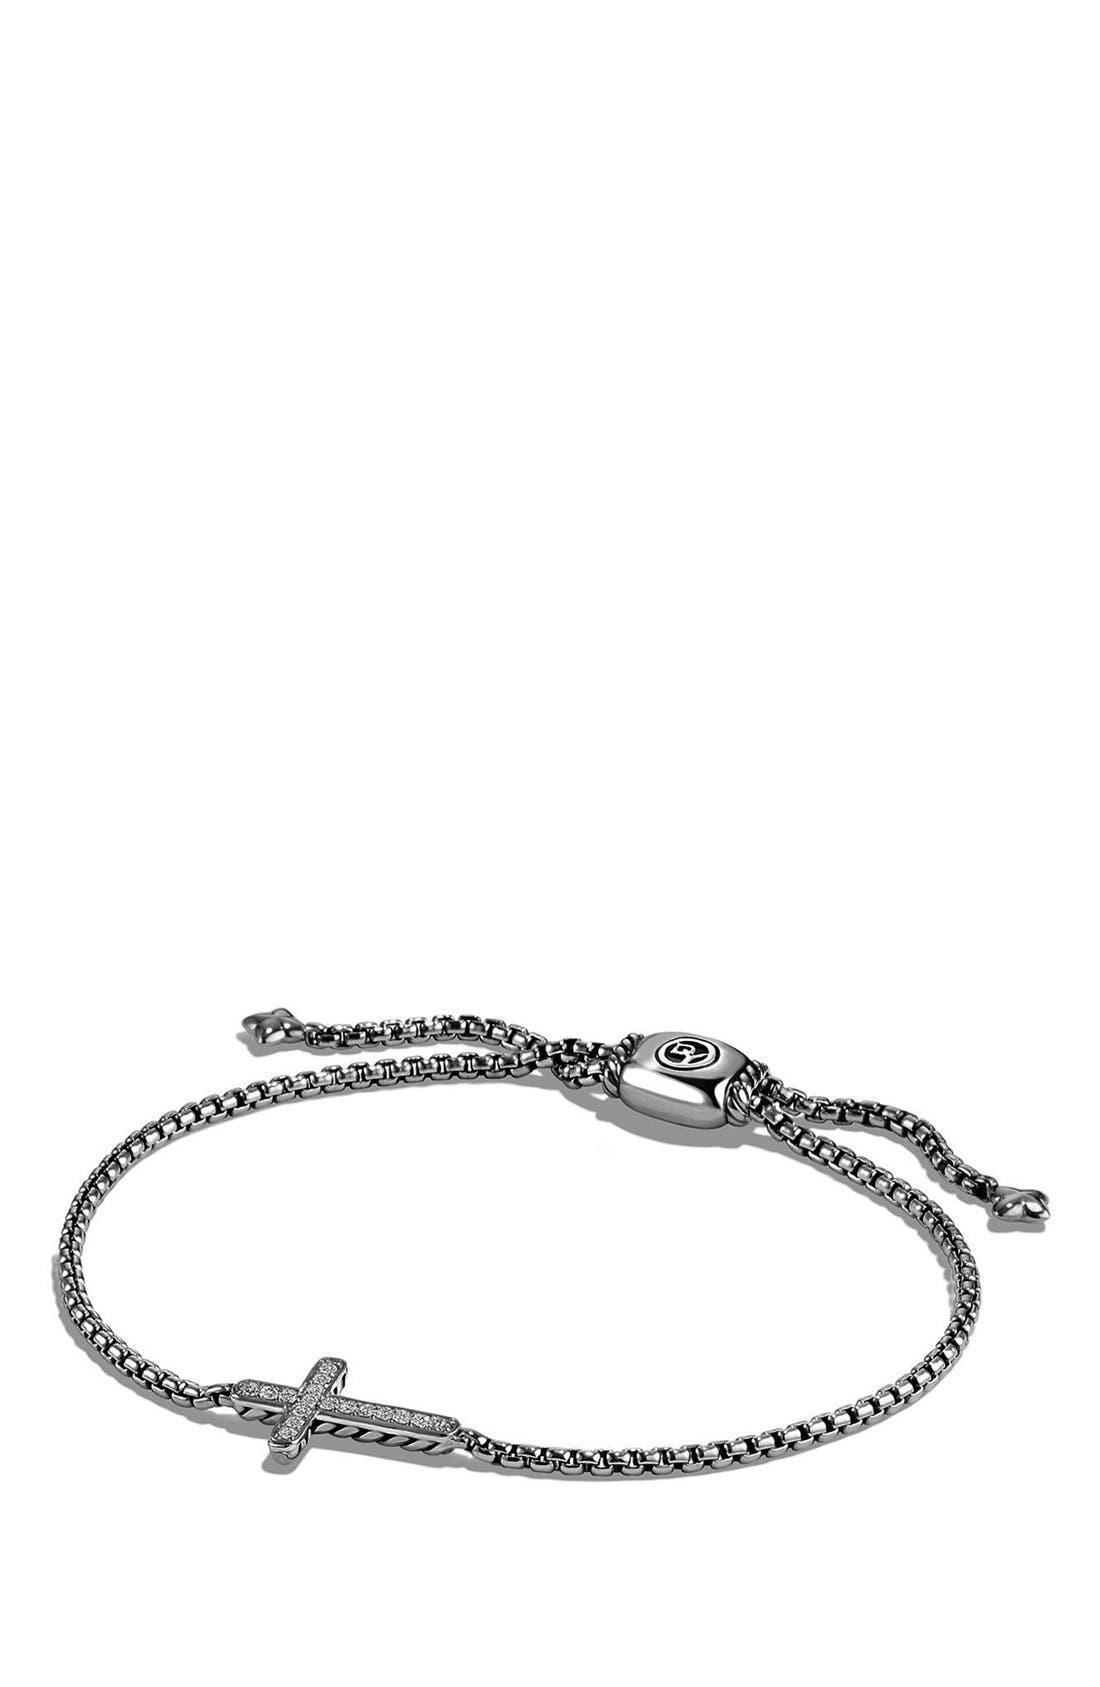 'Petite Pavé' Cross Bracelet with Diamonds,                         Main,                         color, SILVER